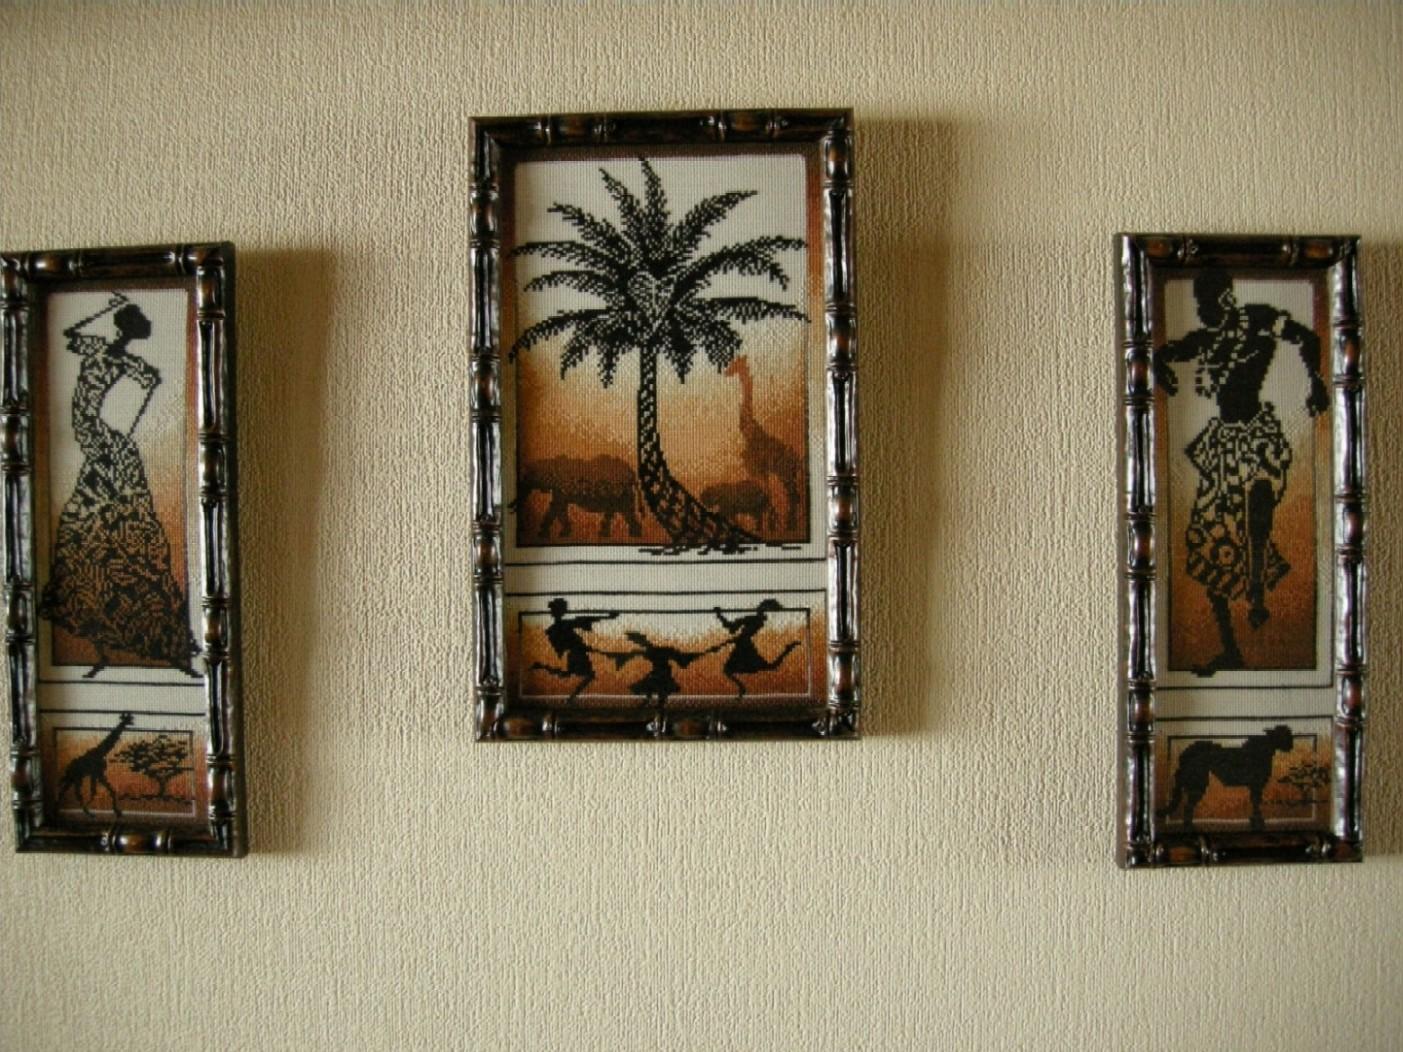 Африканские истории. Пейзажи